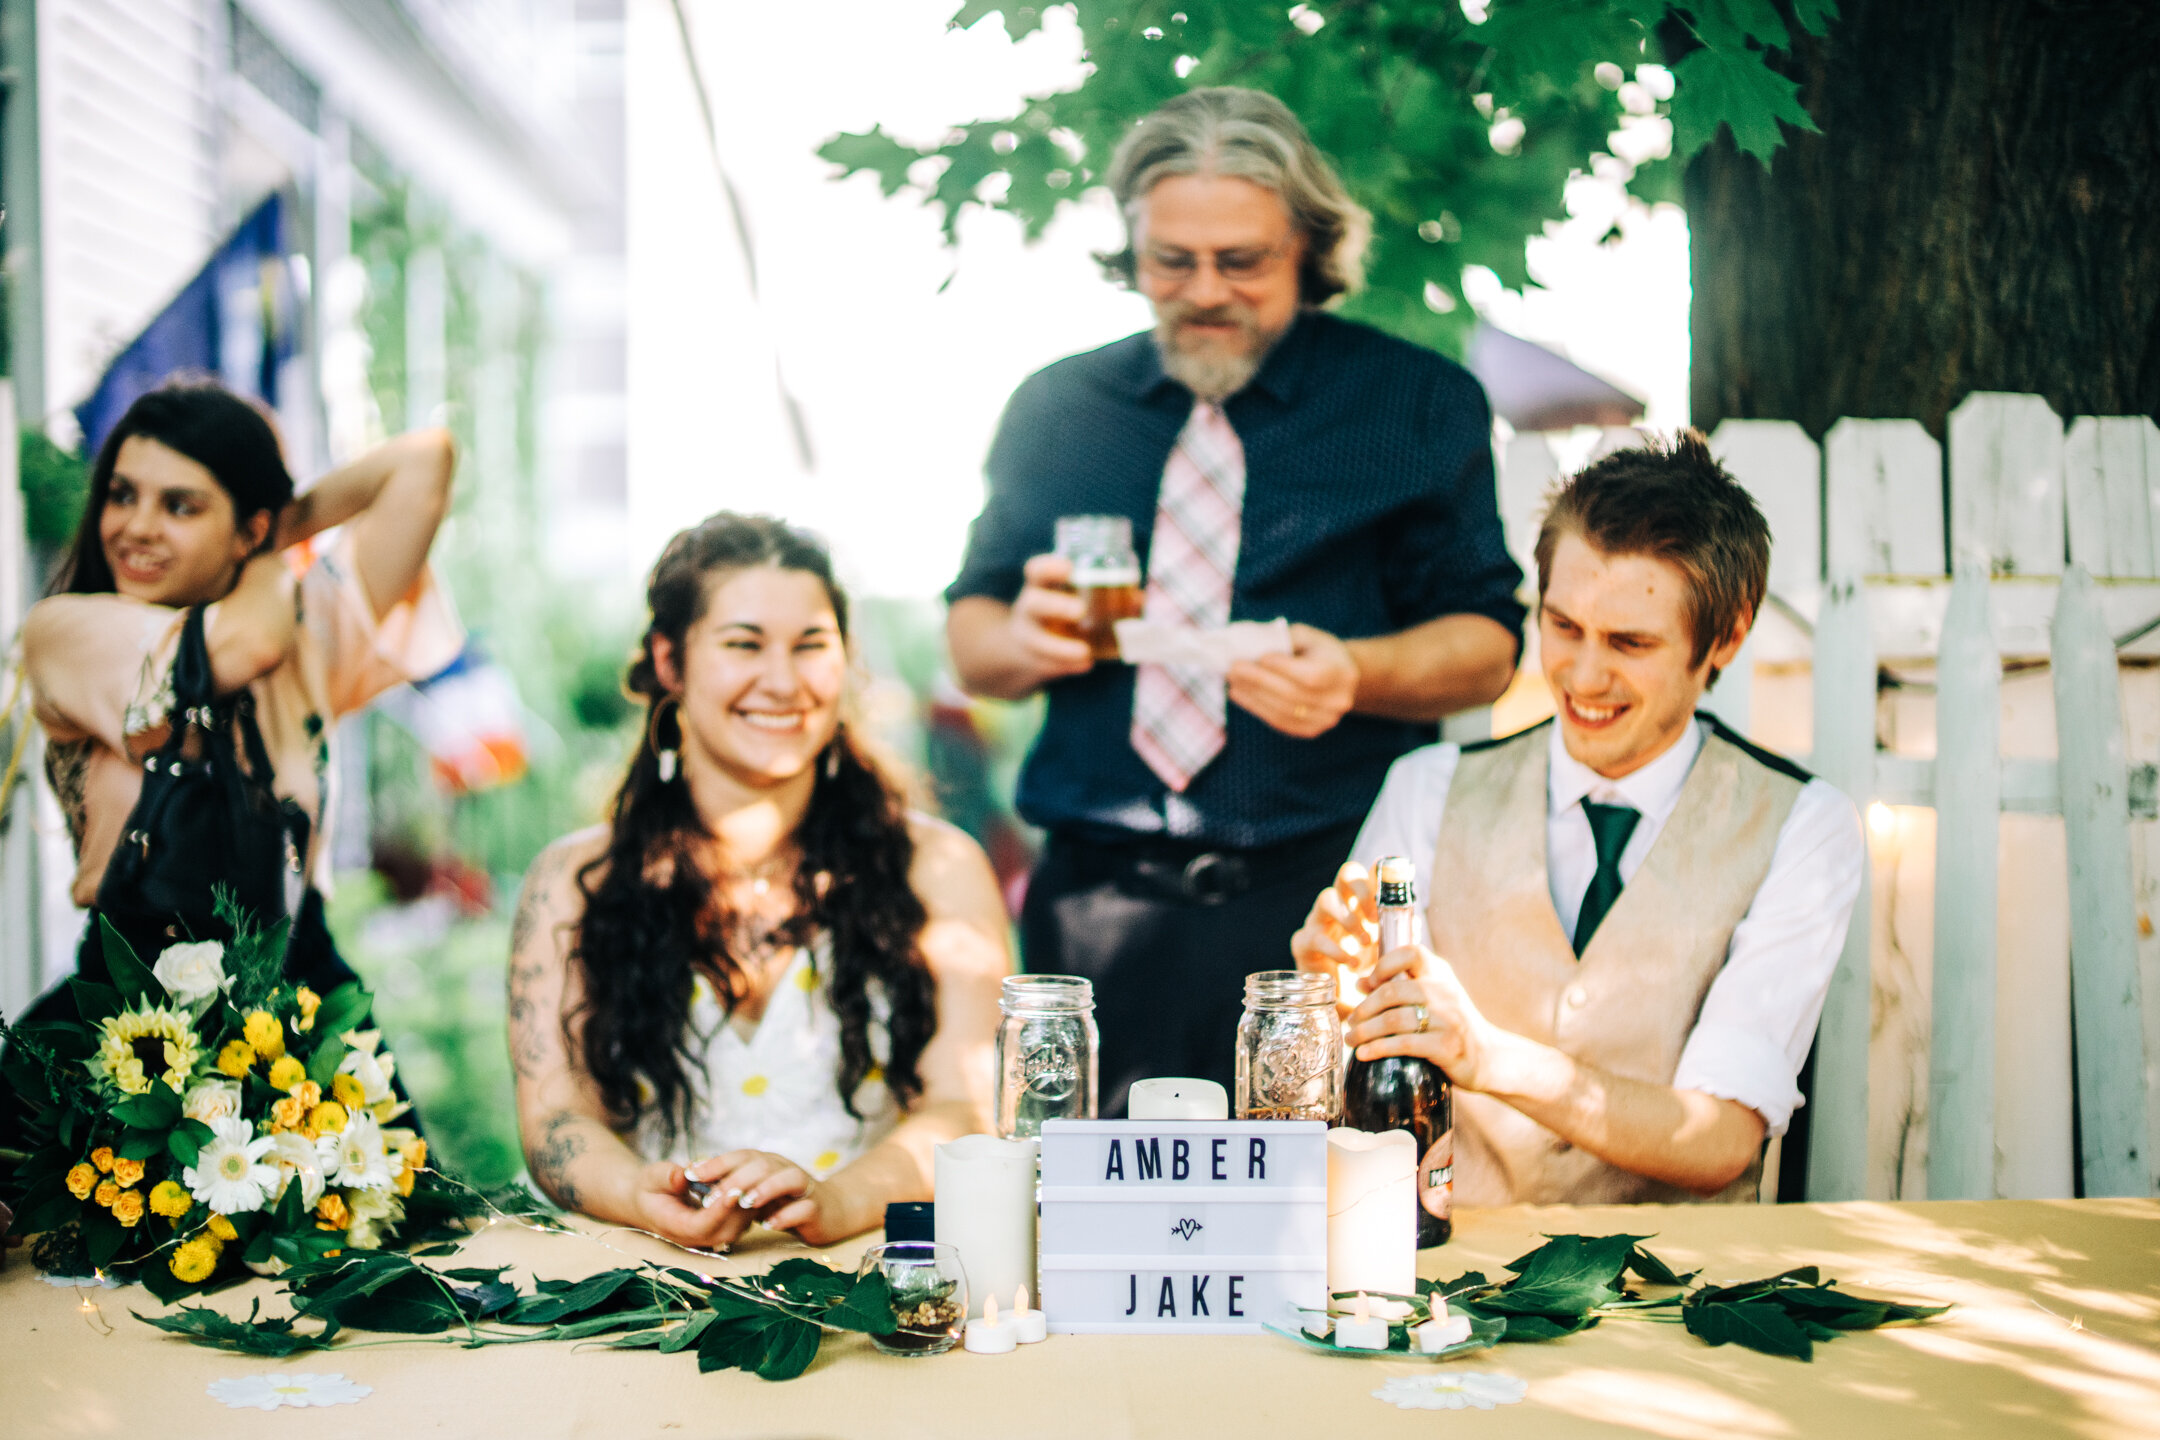 Jake-Amber-Wedding-01479.jpg